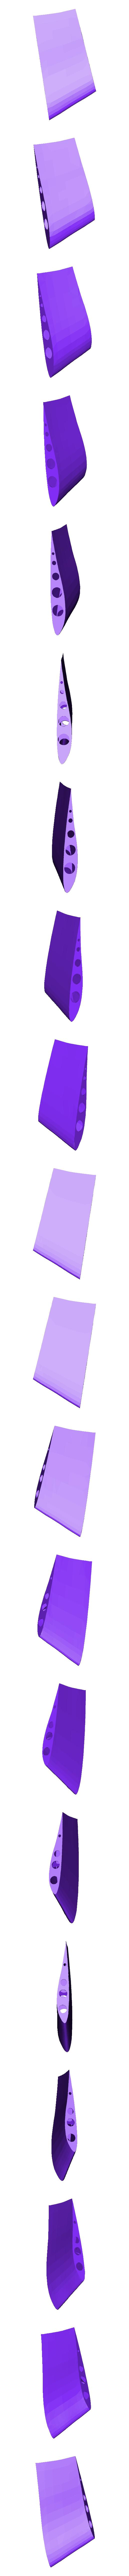 Wing L 2.obj Download free OBJ file Small Static Horten 229 • 3D printable object, francoispeyper